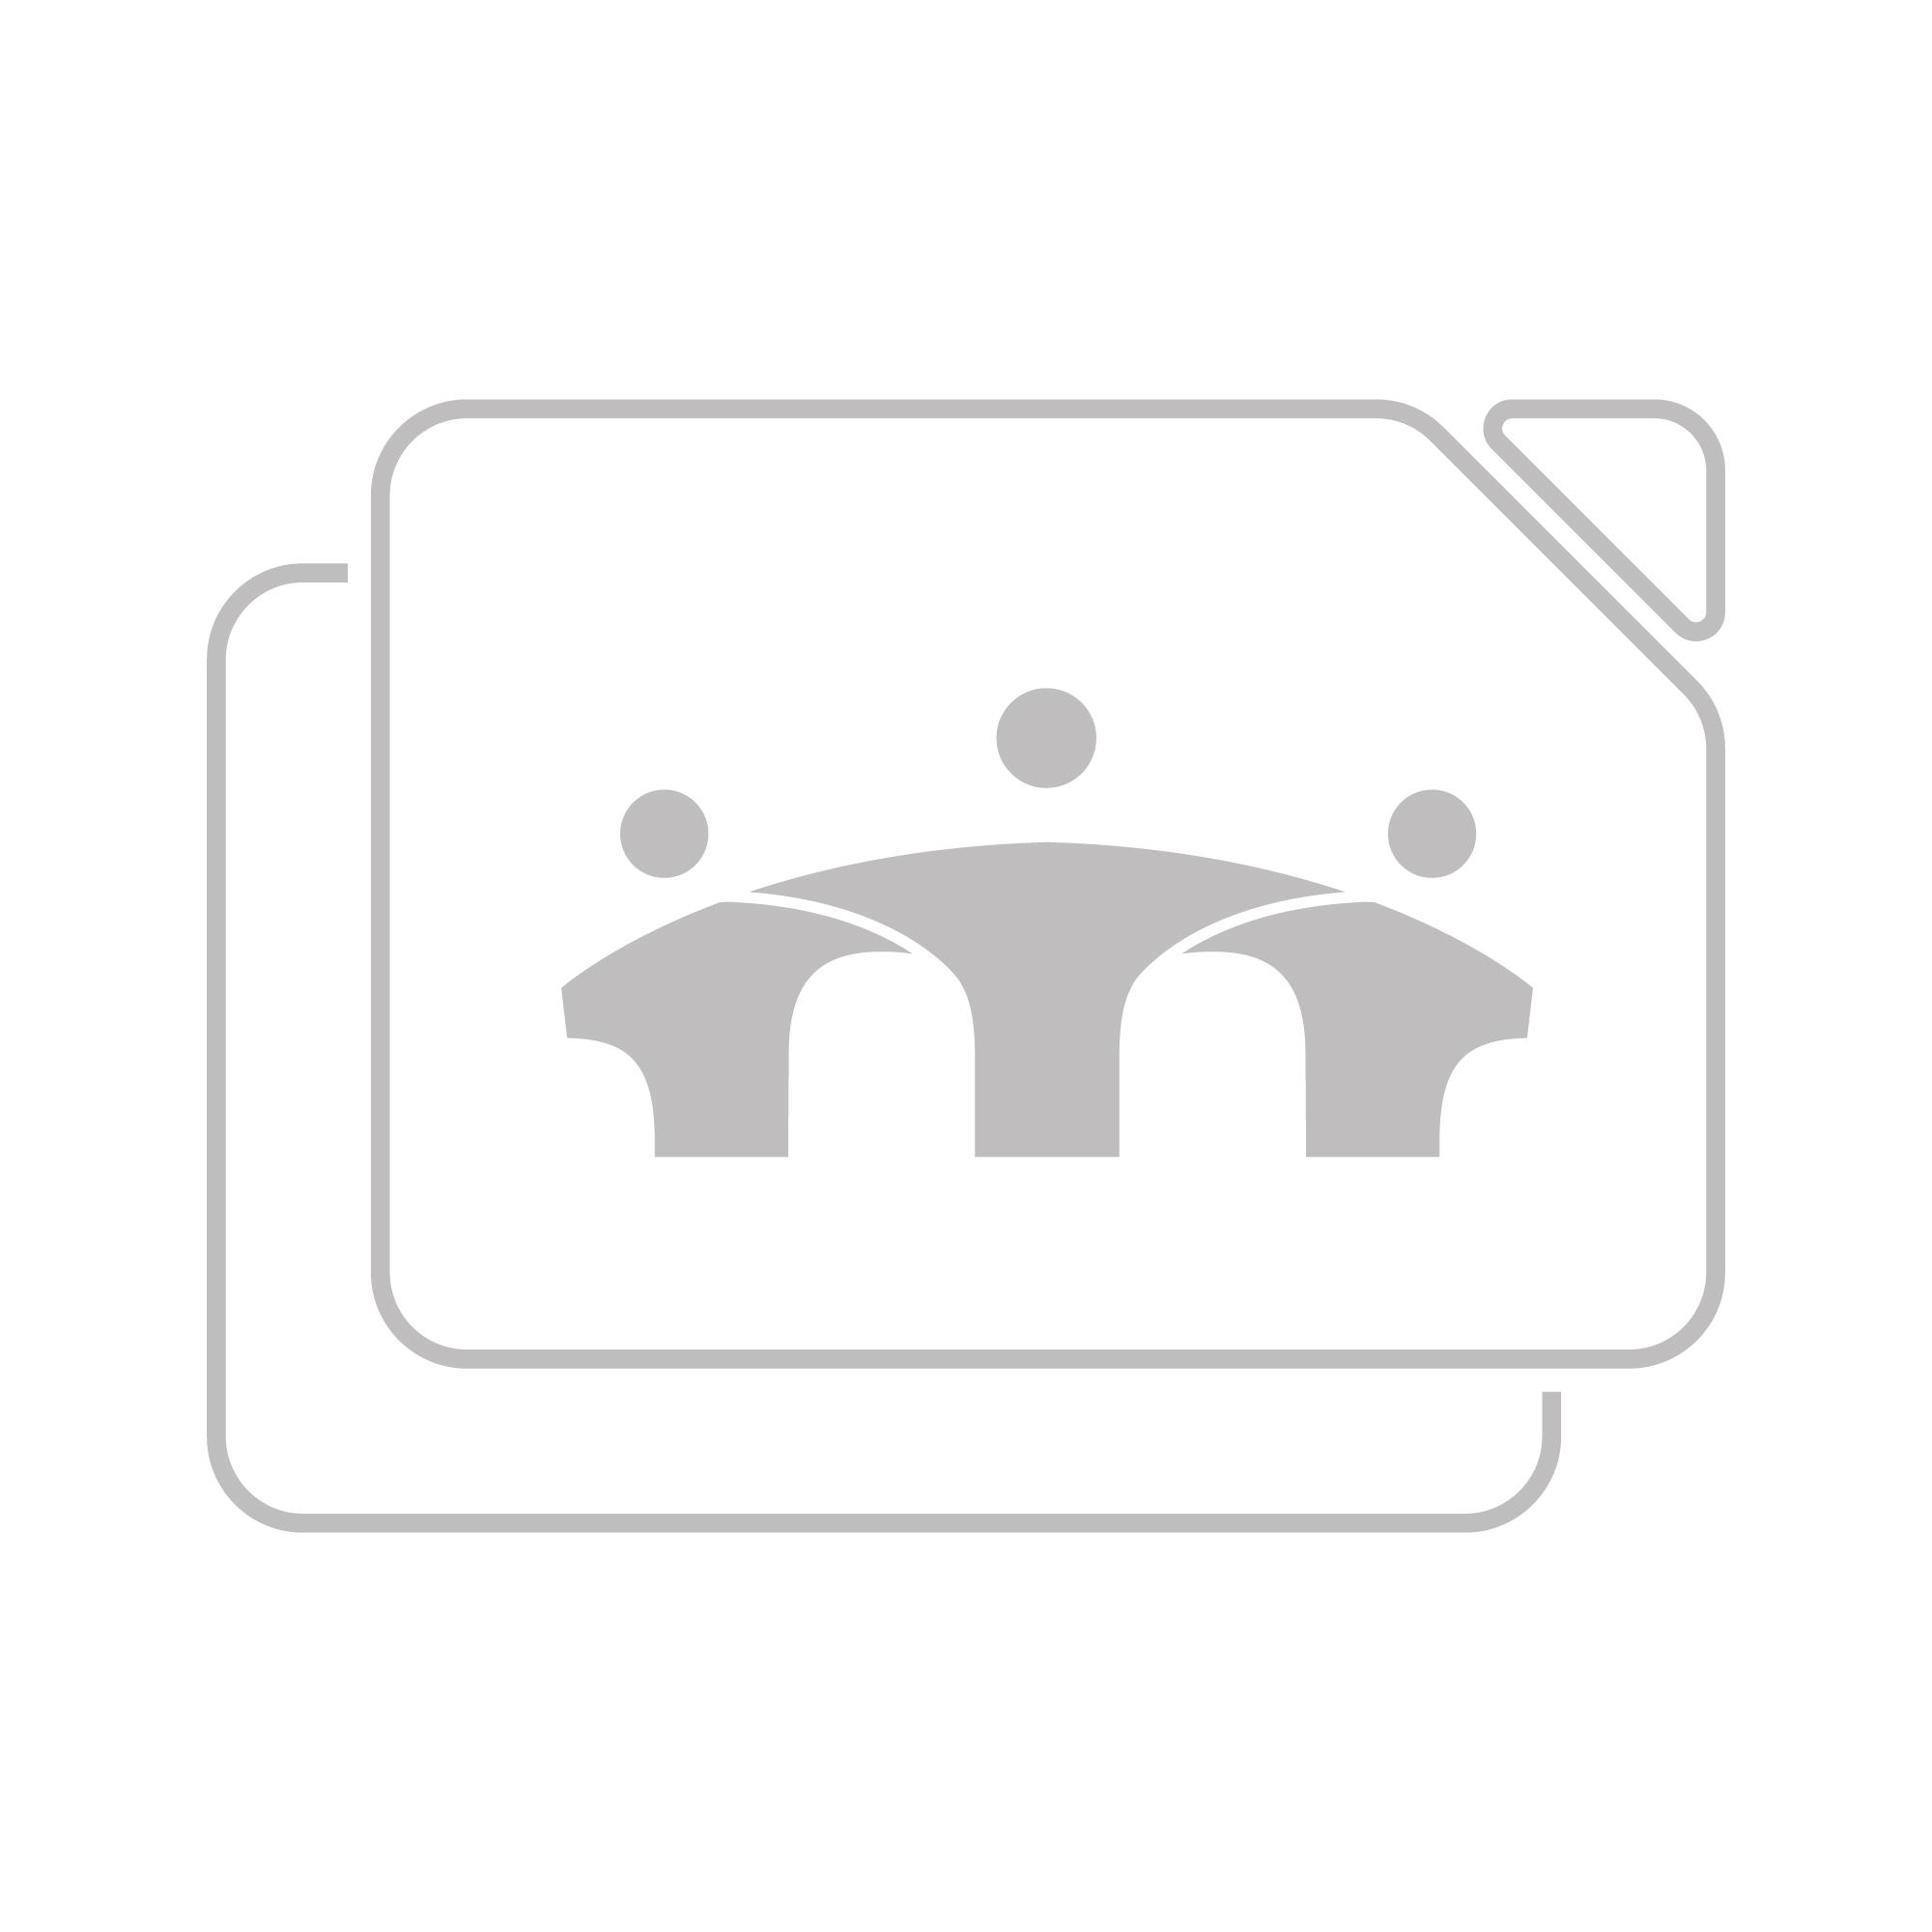 Seagate FireCuda 530 NVMe SSD 4TB Heatsink